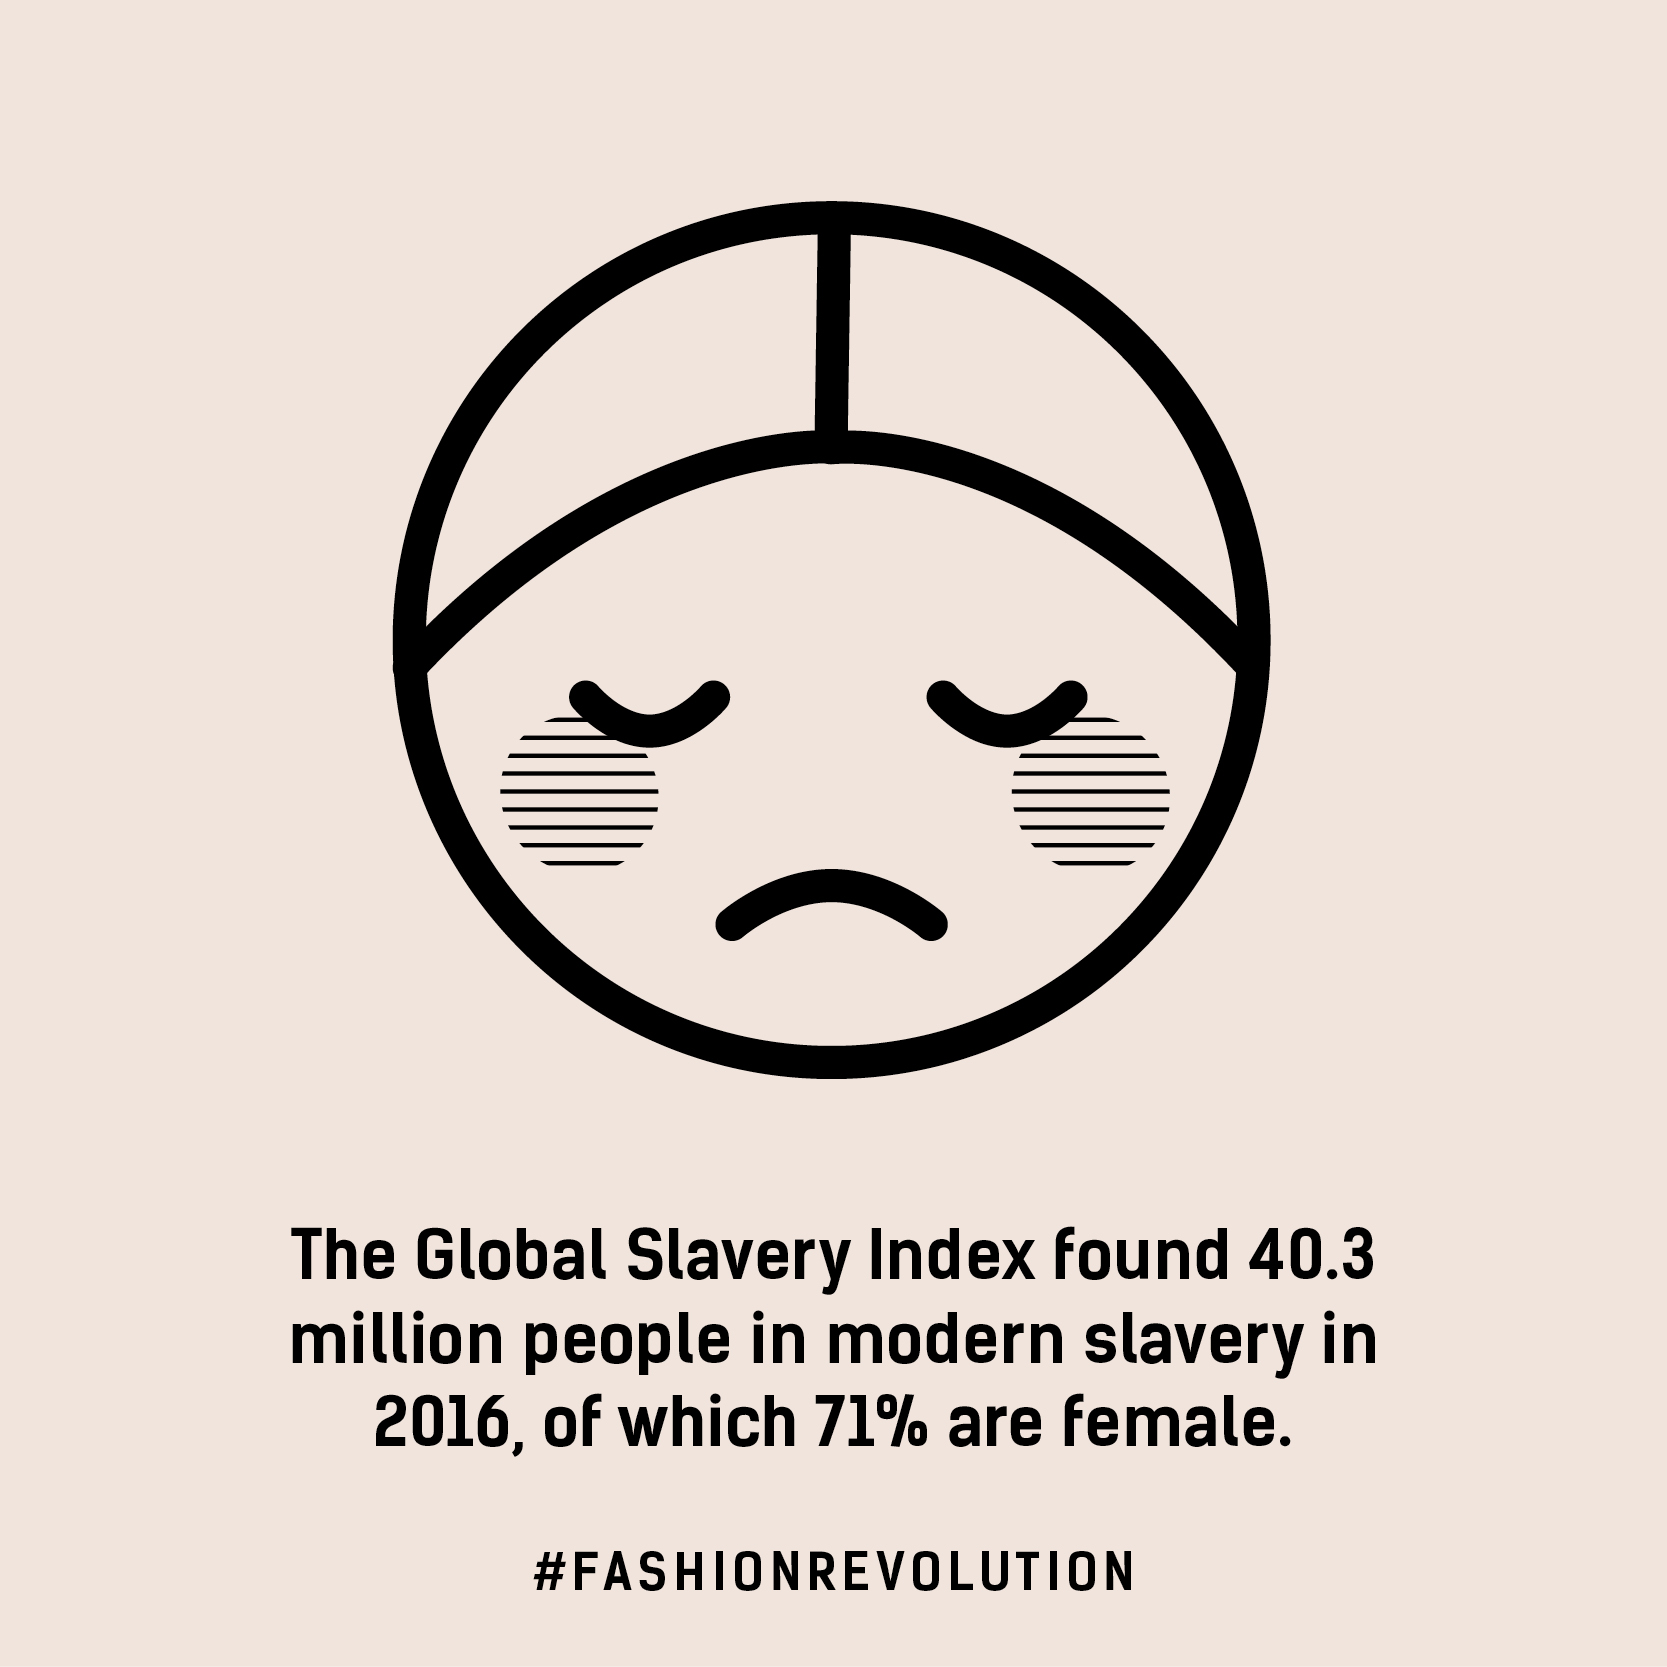 fashion revolution week 2019 brighton girl